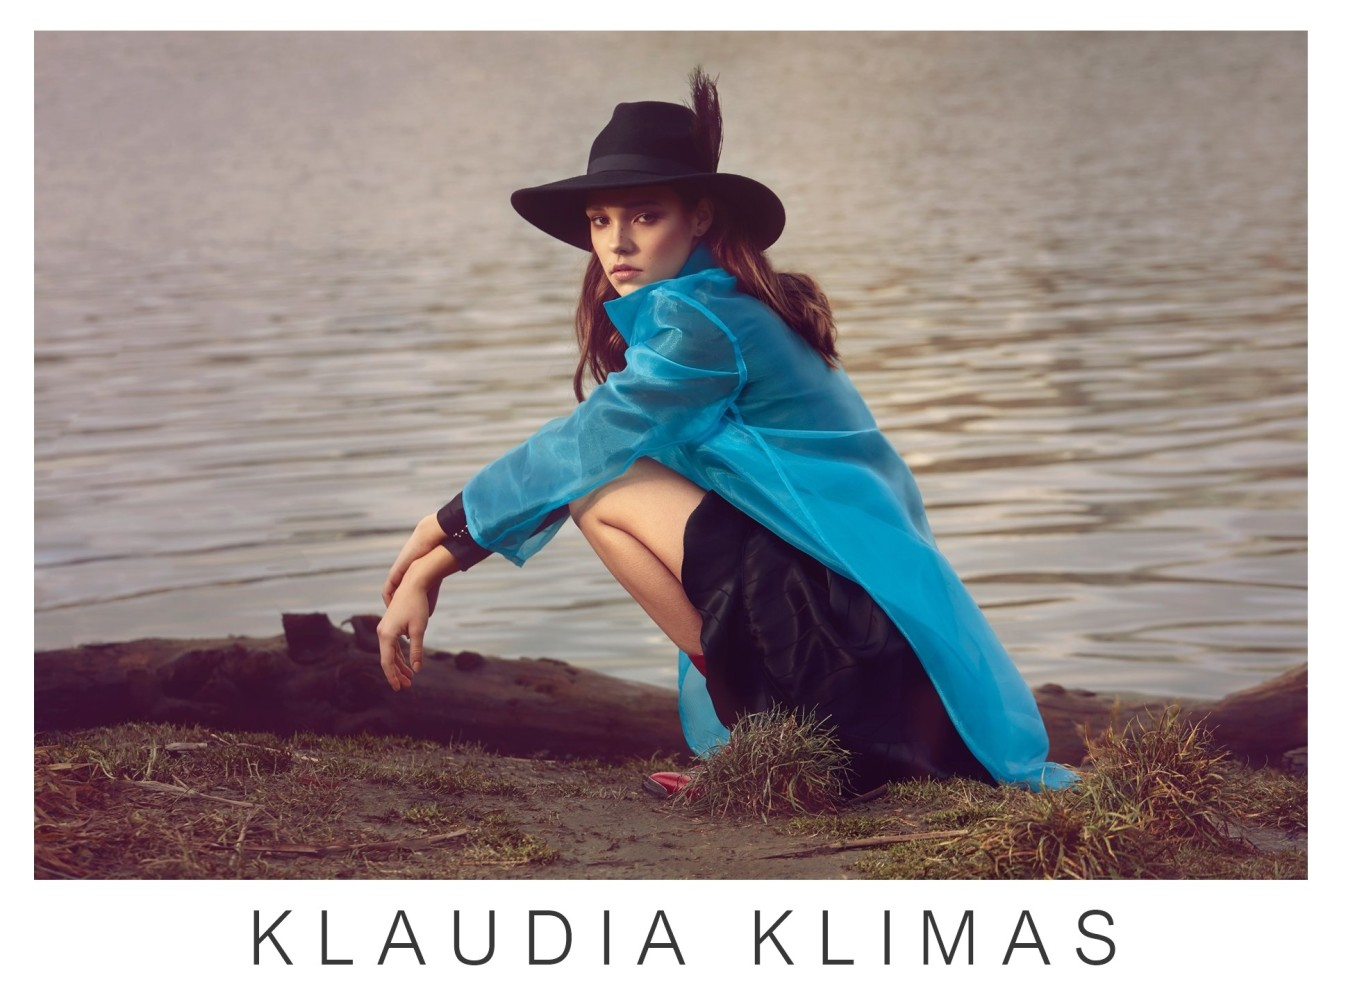 Natia for Klaudia Klimas Lookbook 2020